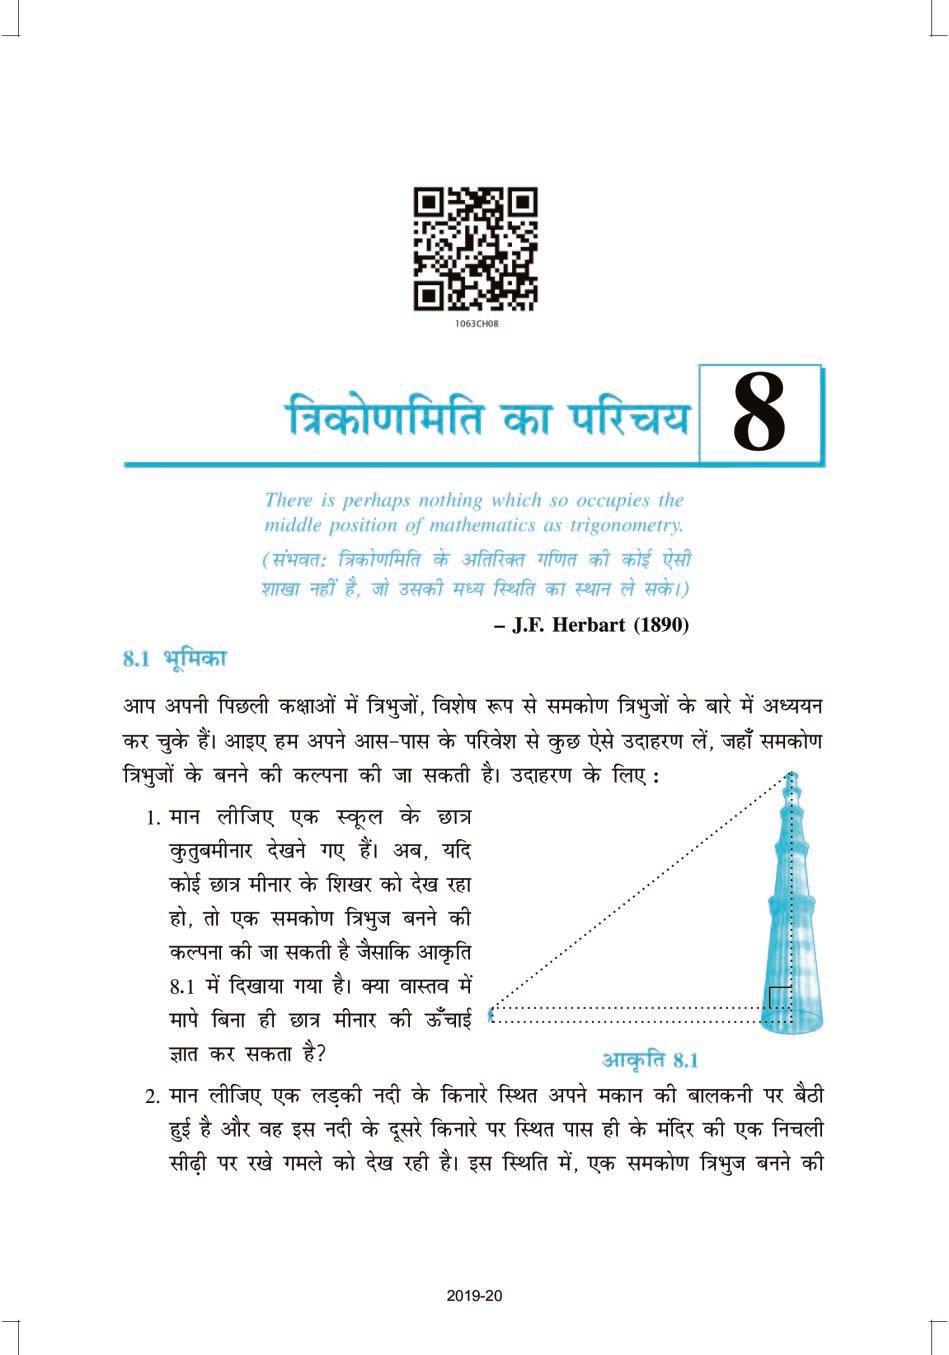 NCERT Book Class 10 Maths (गणित) Chapter 8 त्रिकोणमिति का परिचय - Page 1